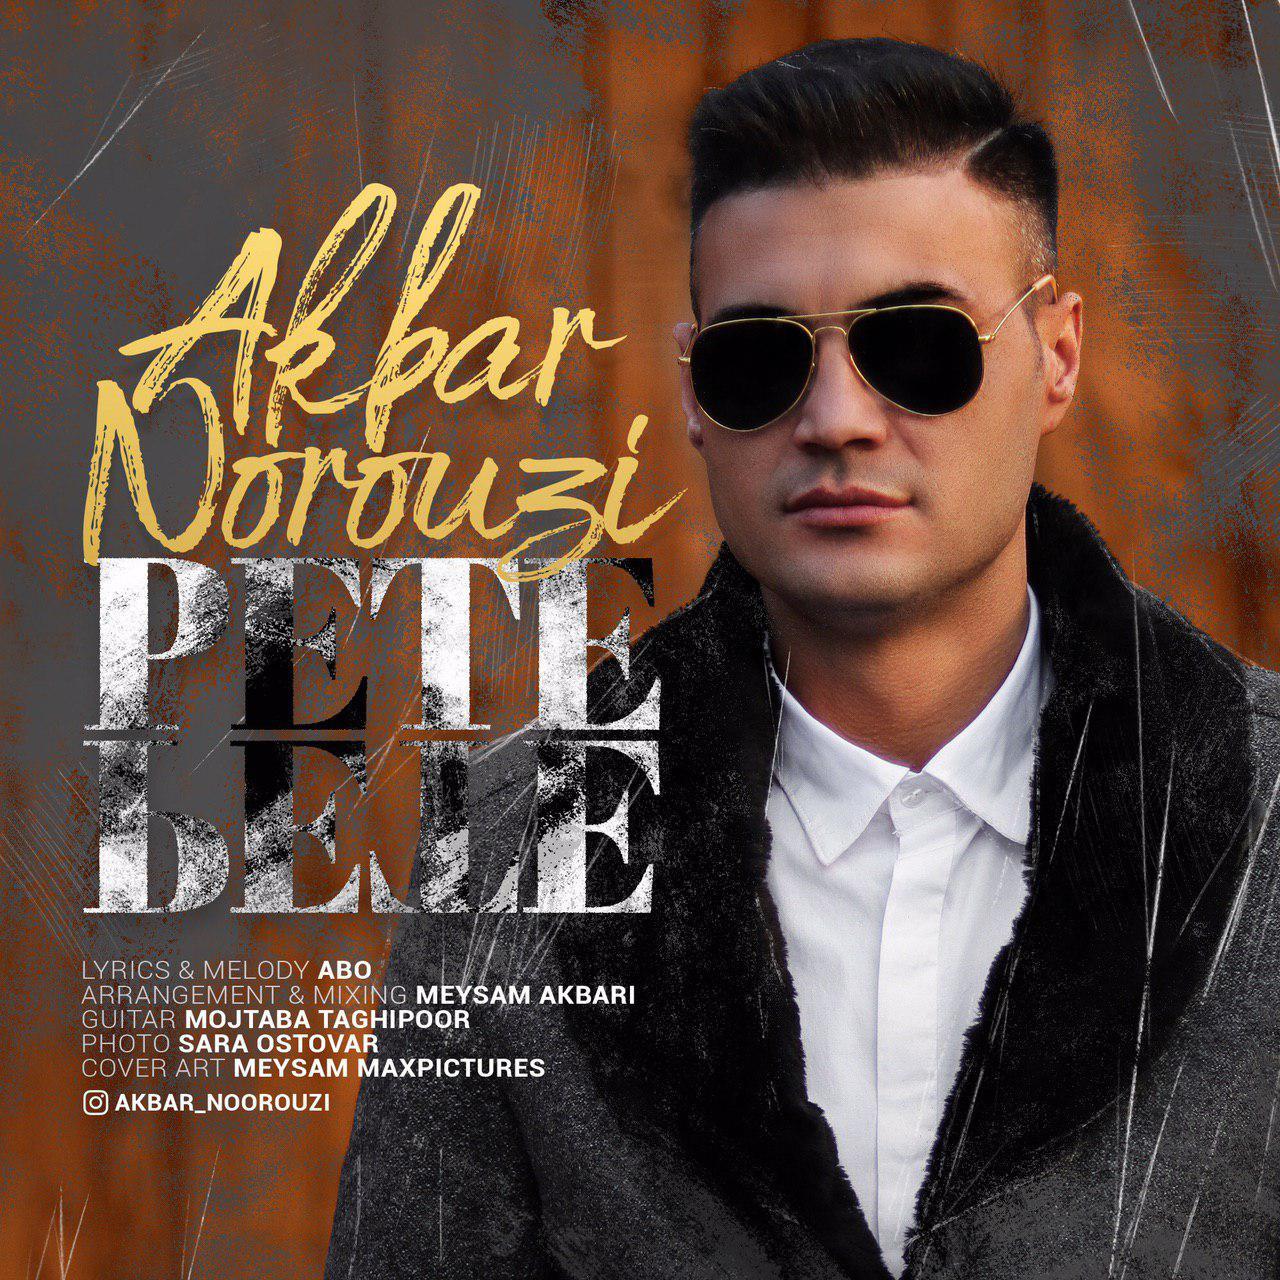 Akbar Norouzi – Pete Pete